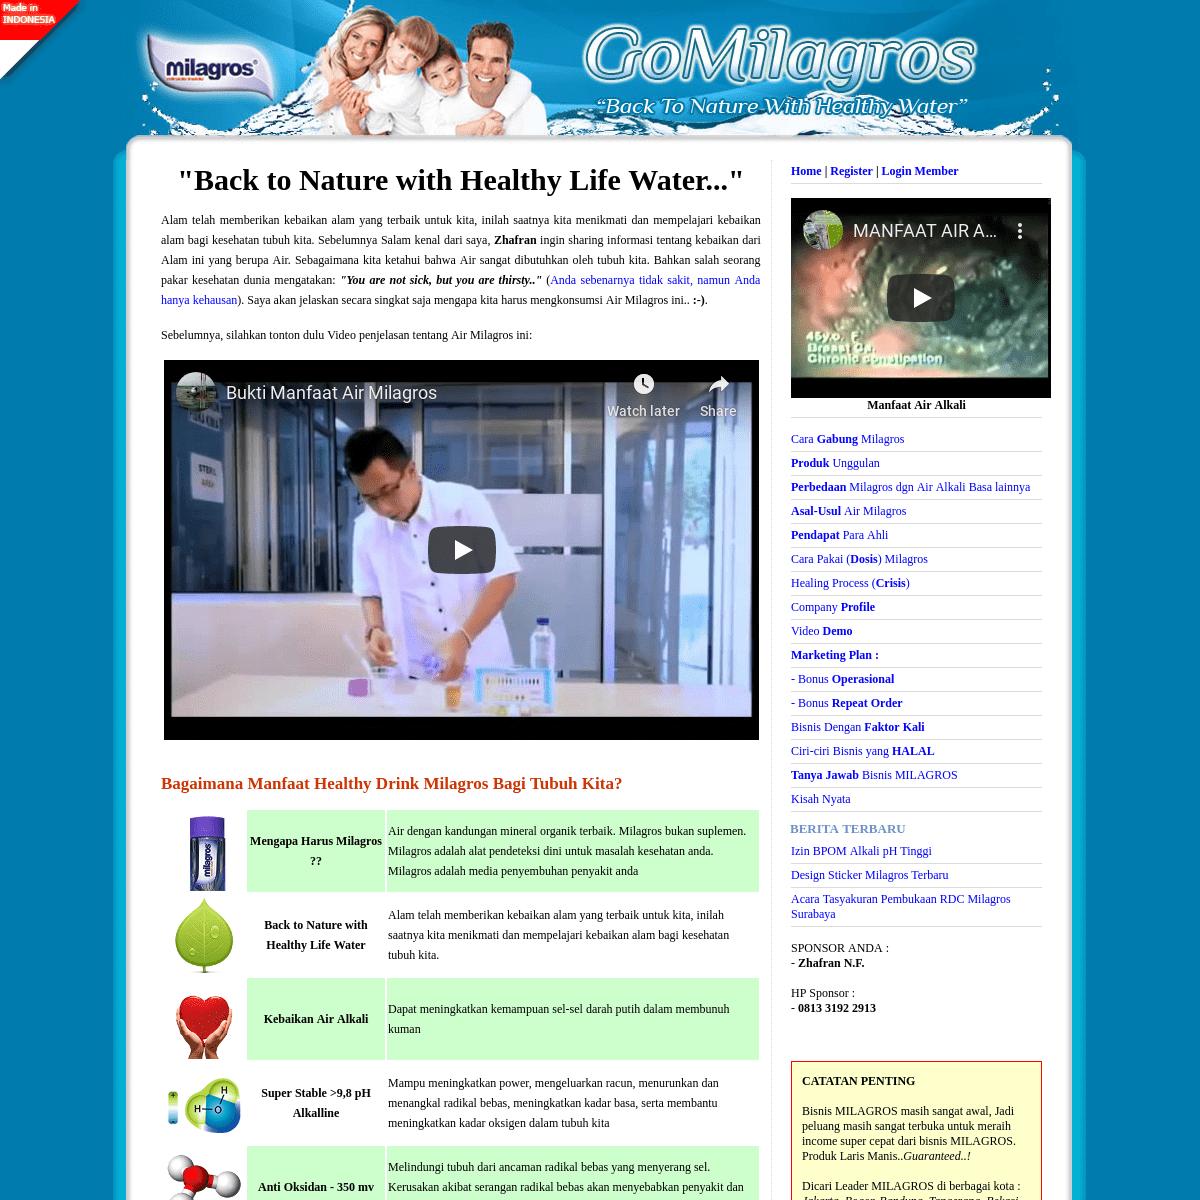 Go Milagros Network